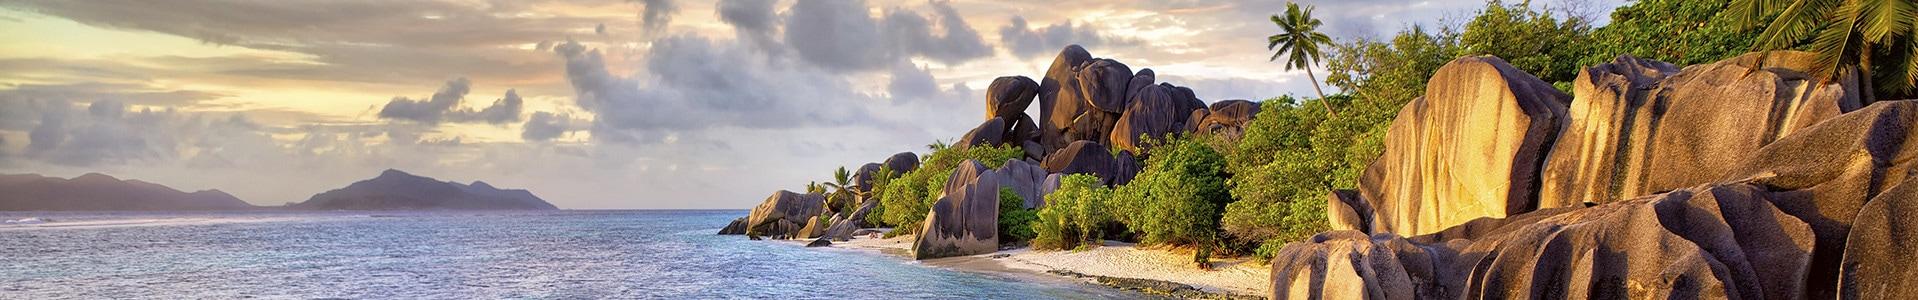 Vol Seychelles - TUI